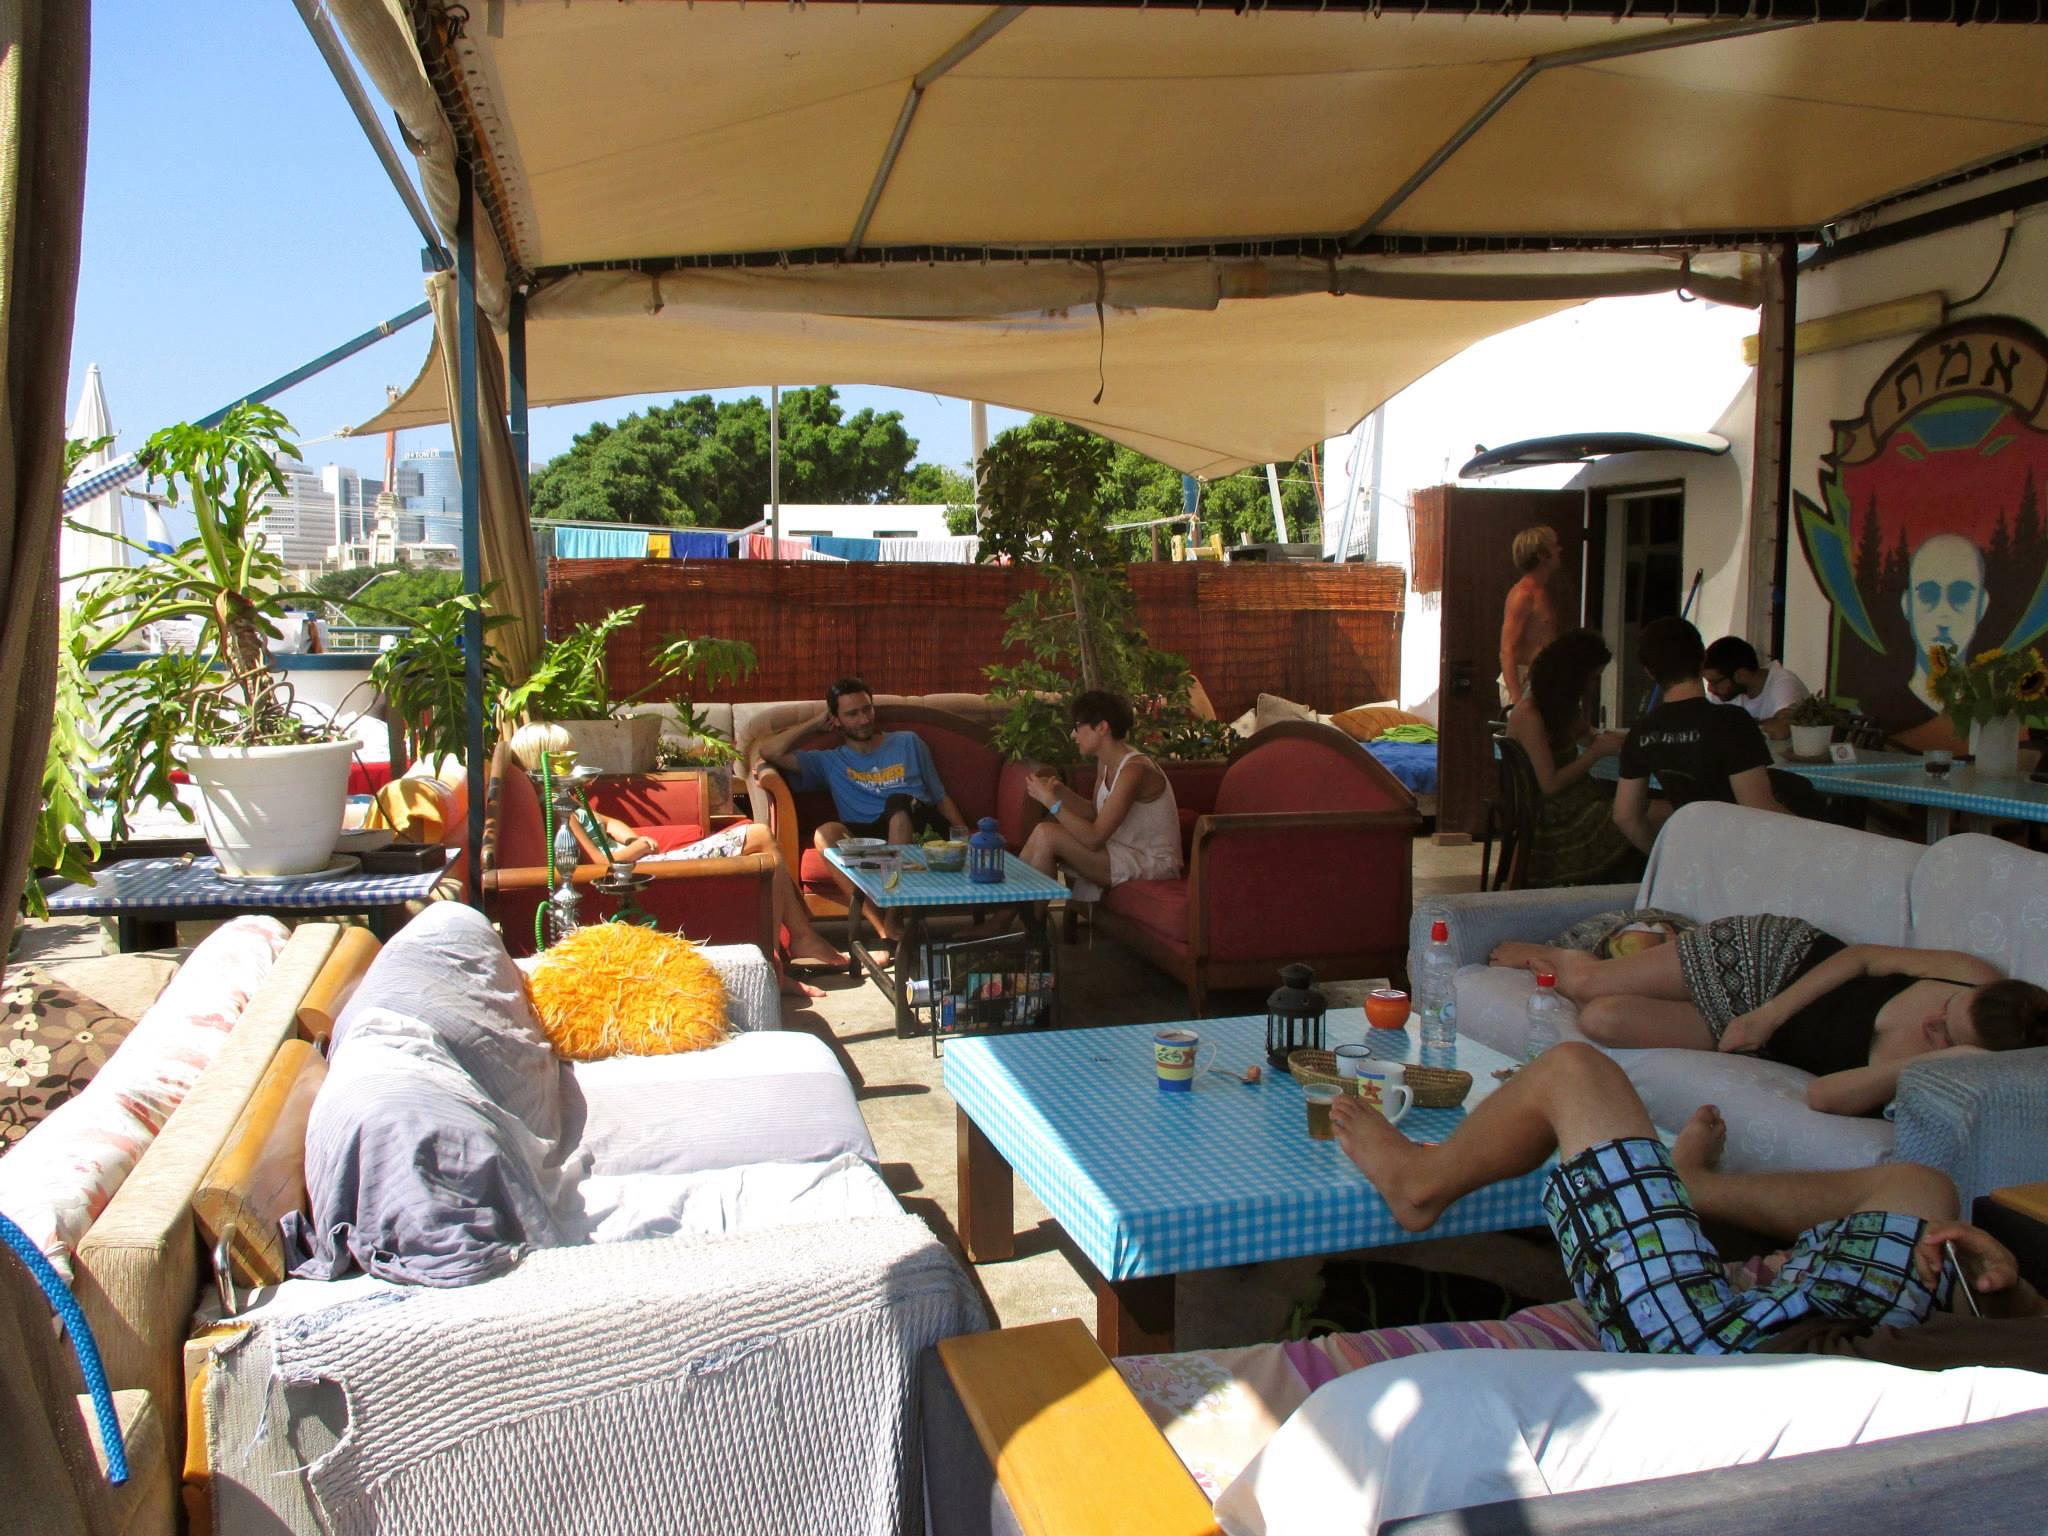 Florentine Hostel common area. We slept outside.